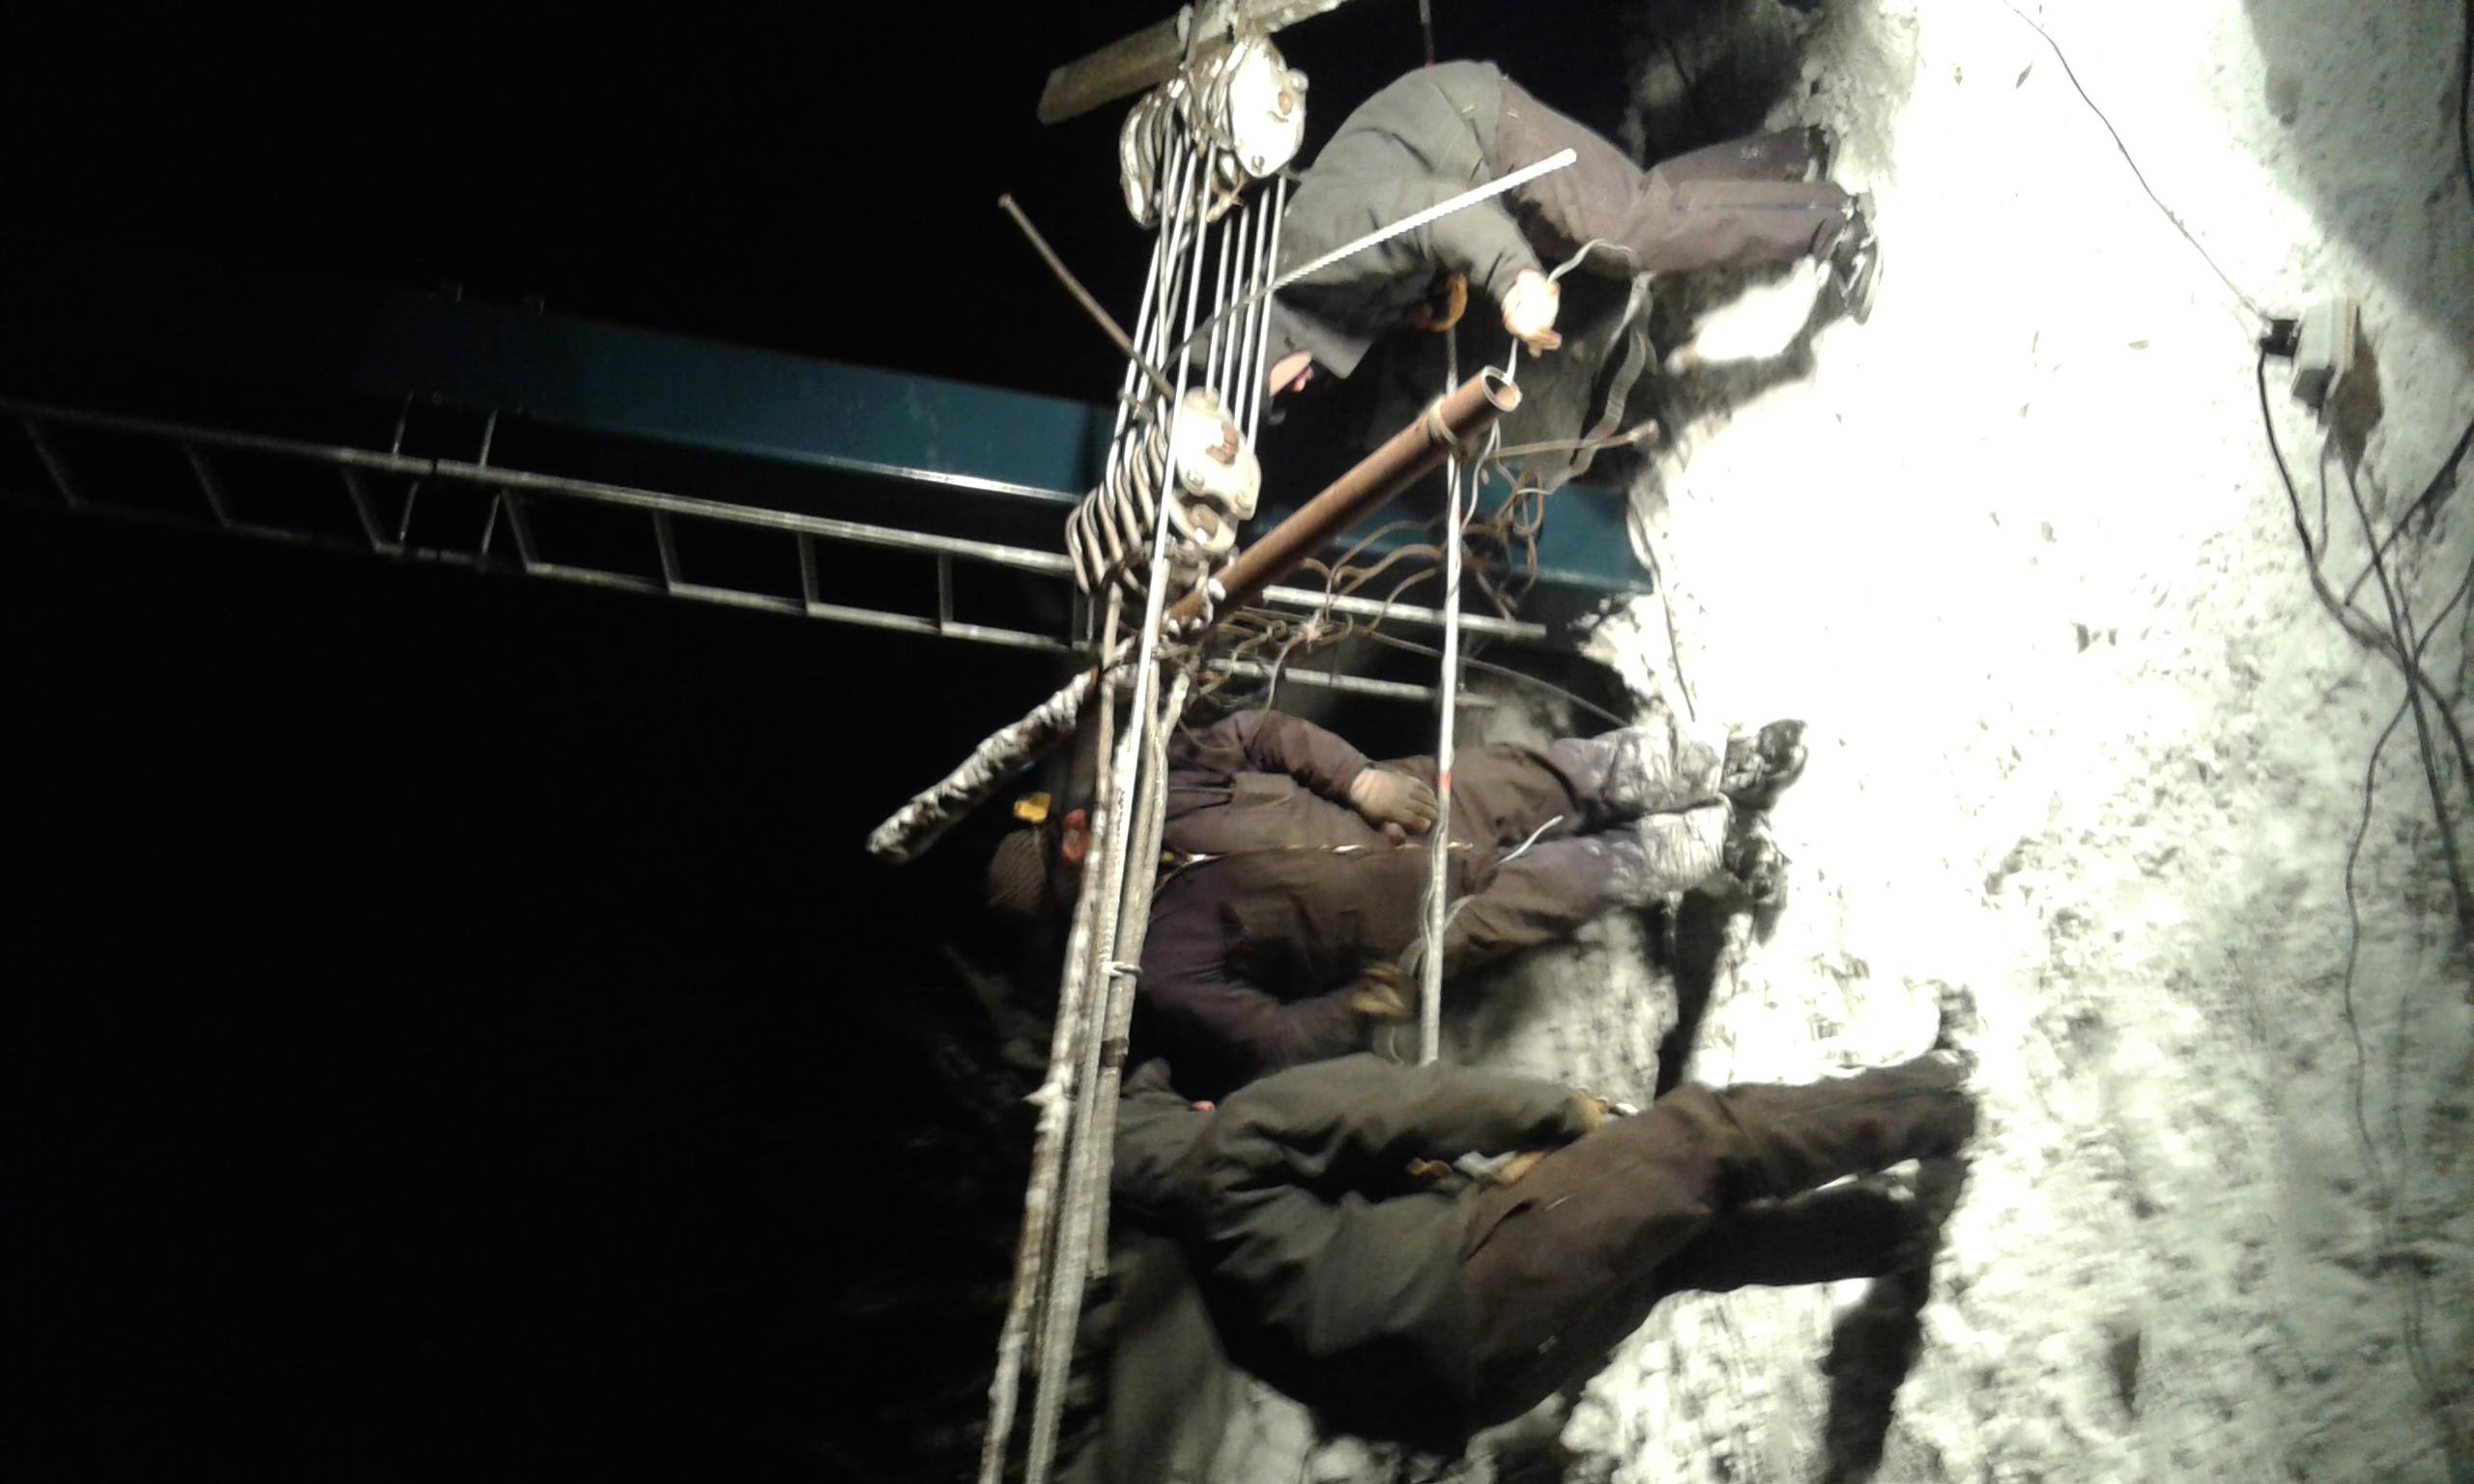 Empalme de cable en la madrugada, Perito Moreno